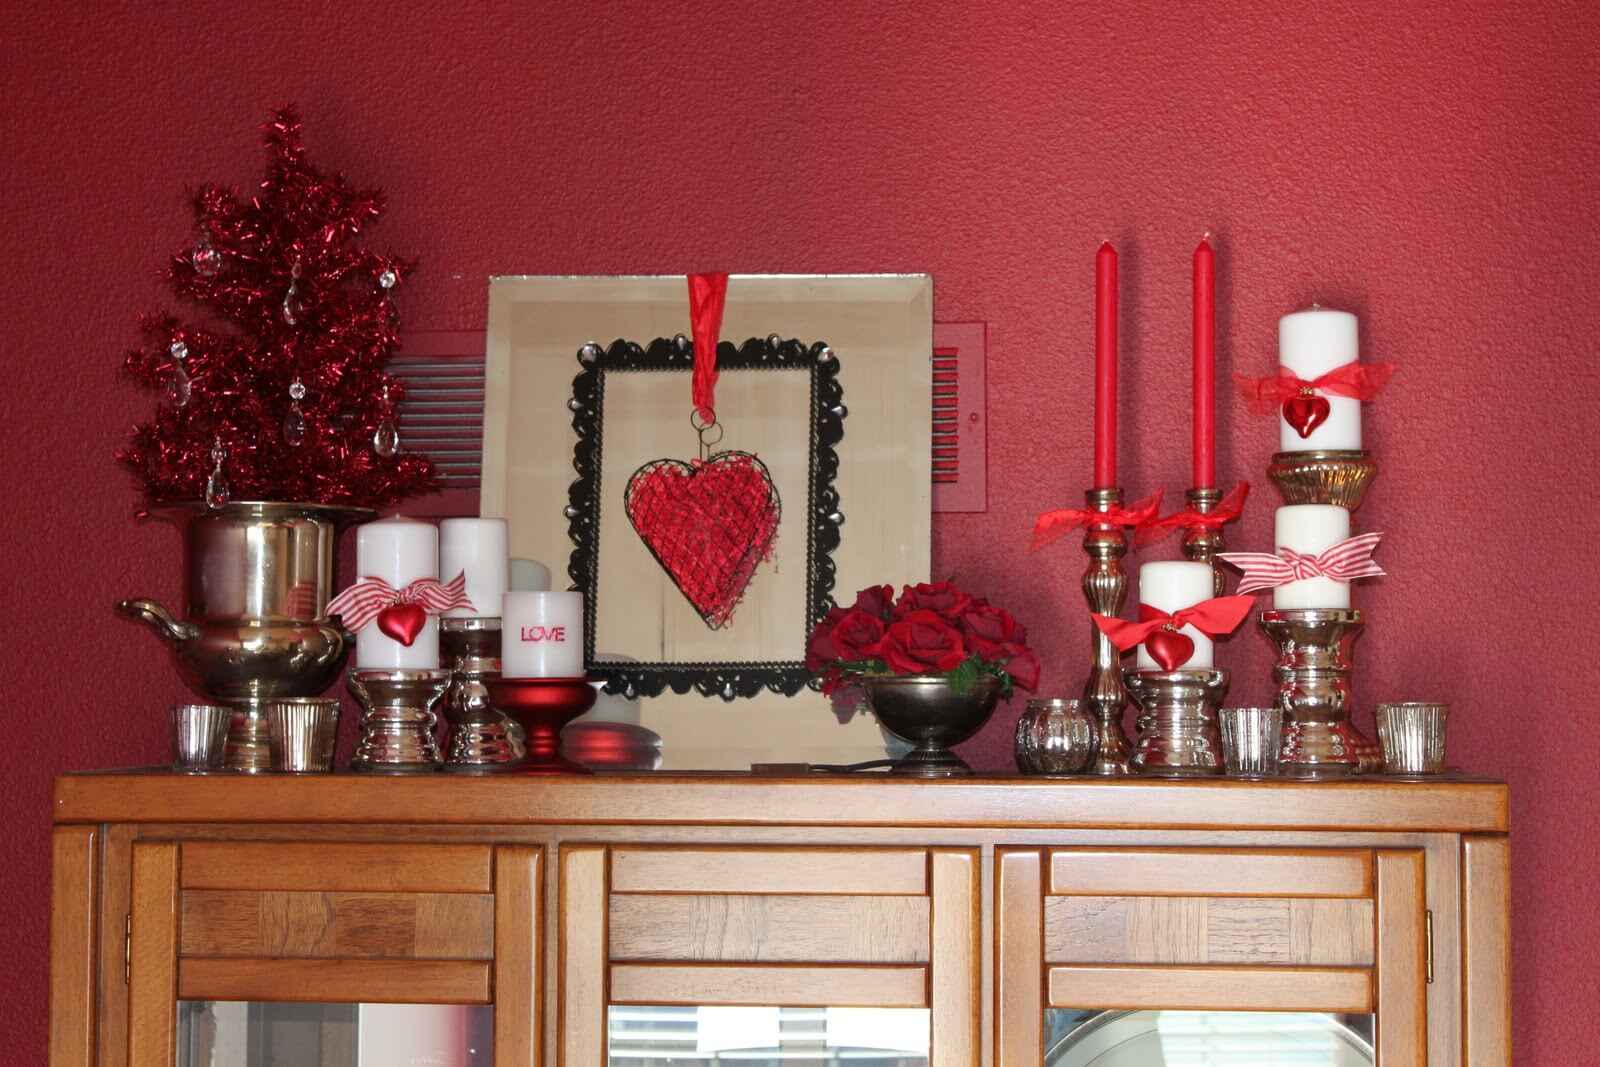 Романтический декор красного цвета